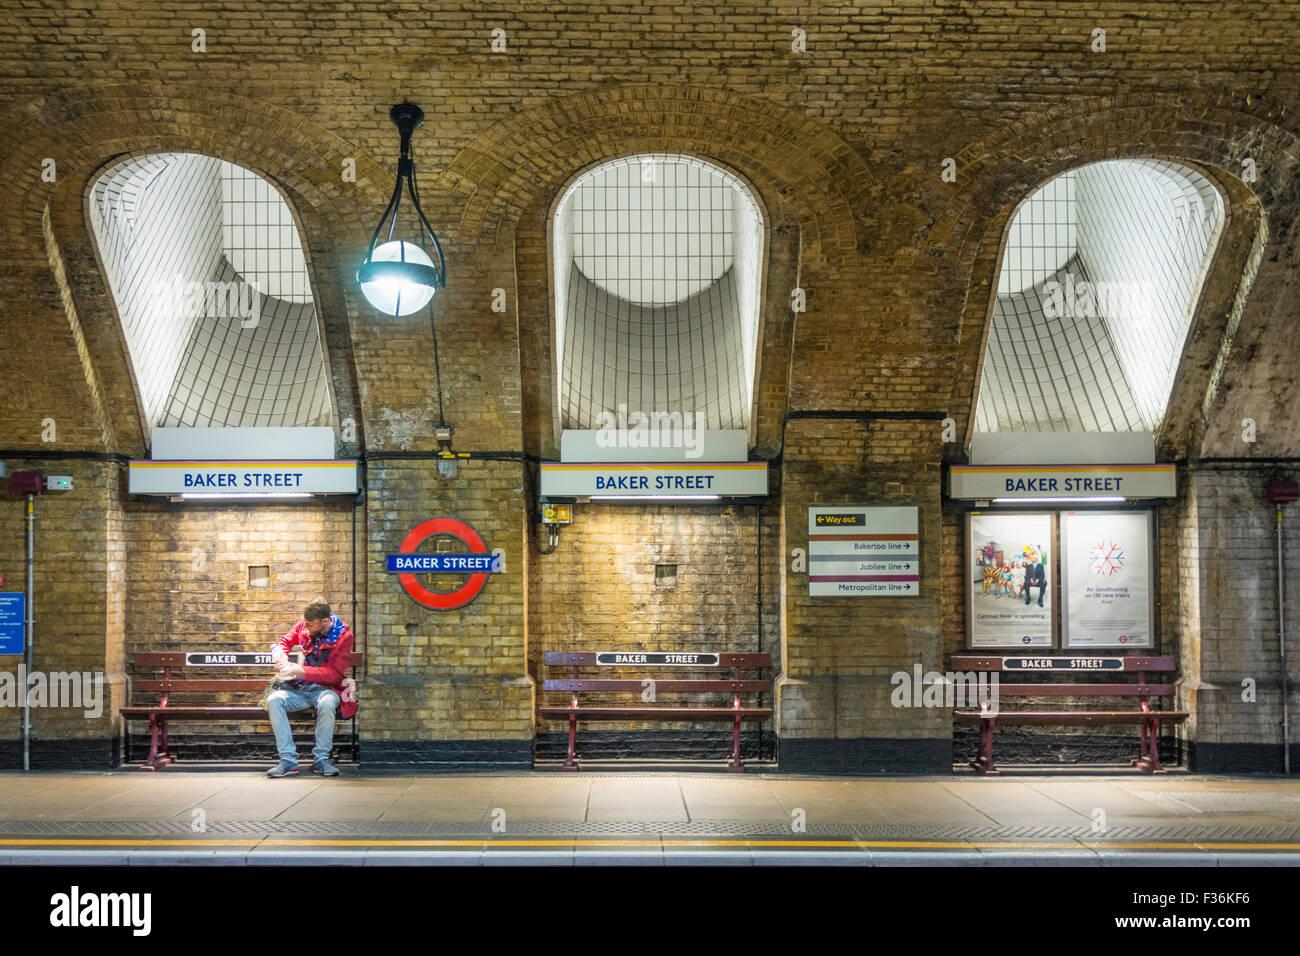 man waiting for a tube train at Baker Street underground station platform London England UK Gb EU Europe - Stock Image